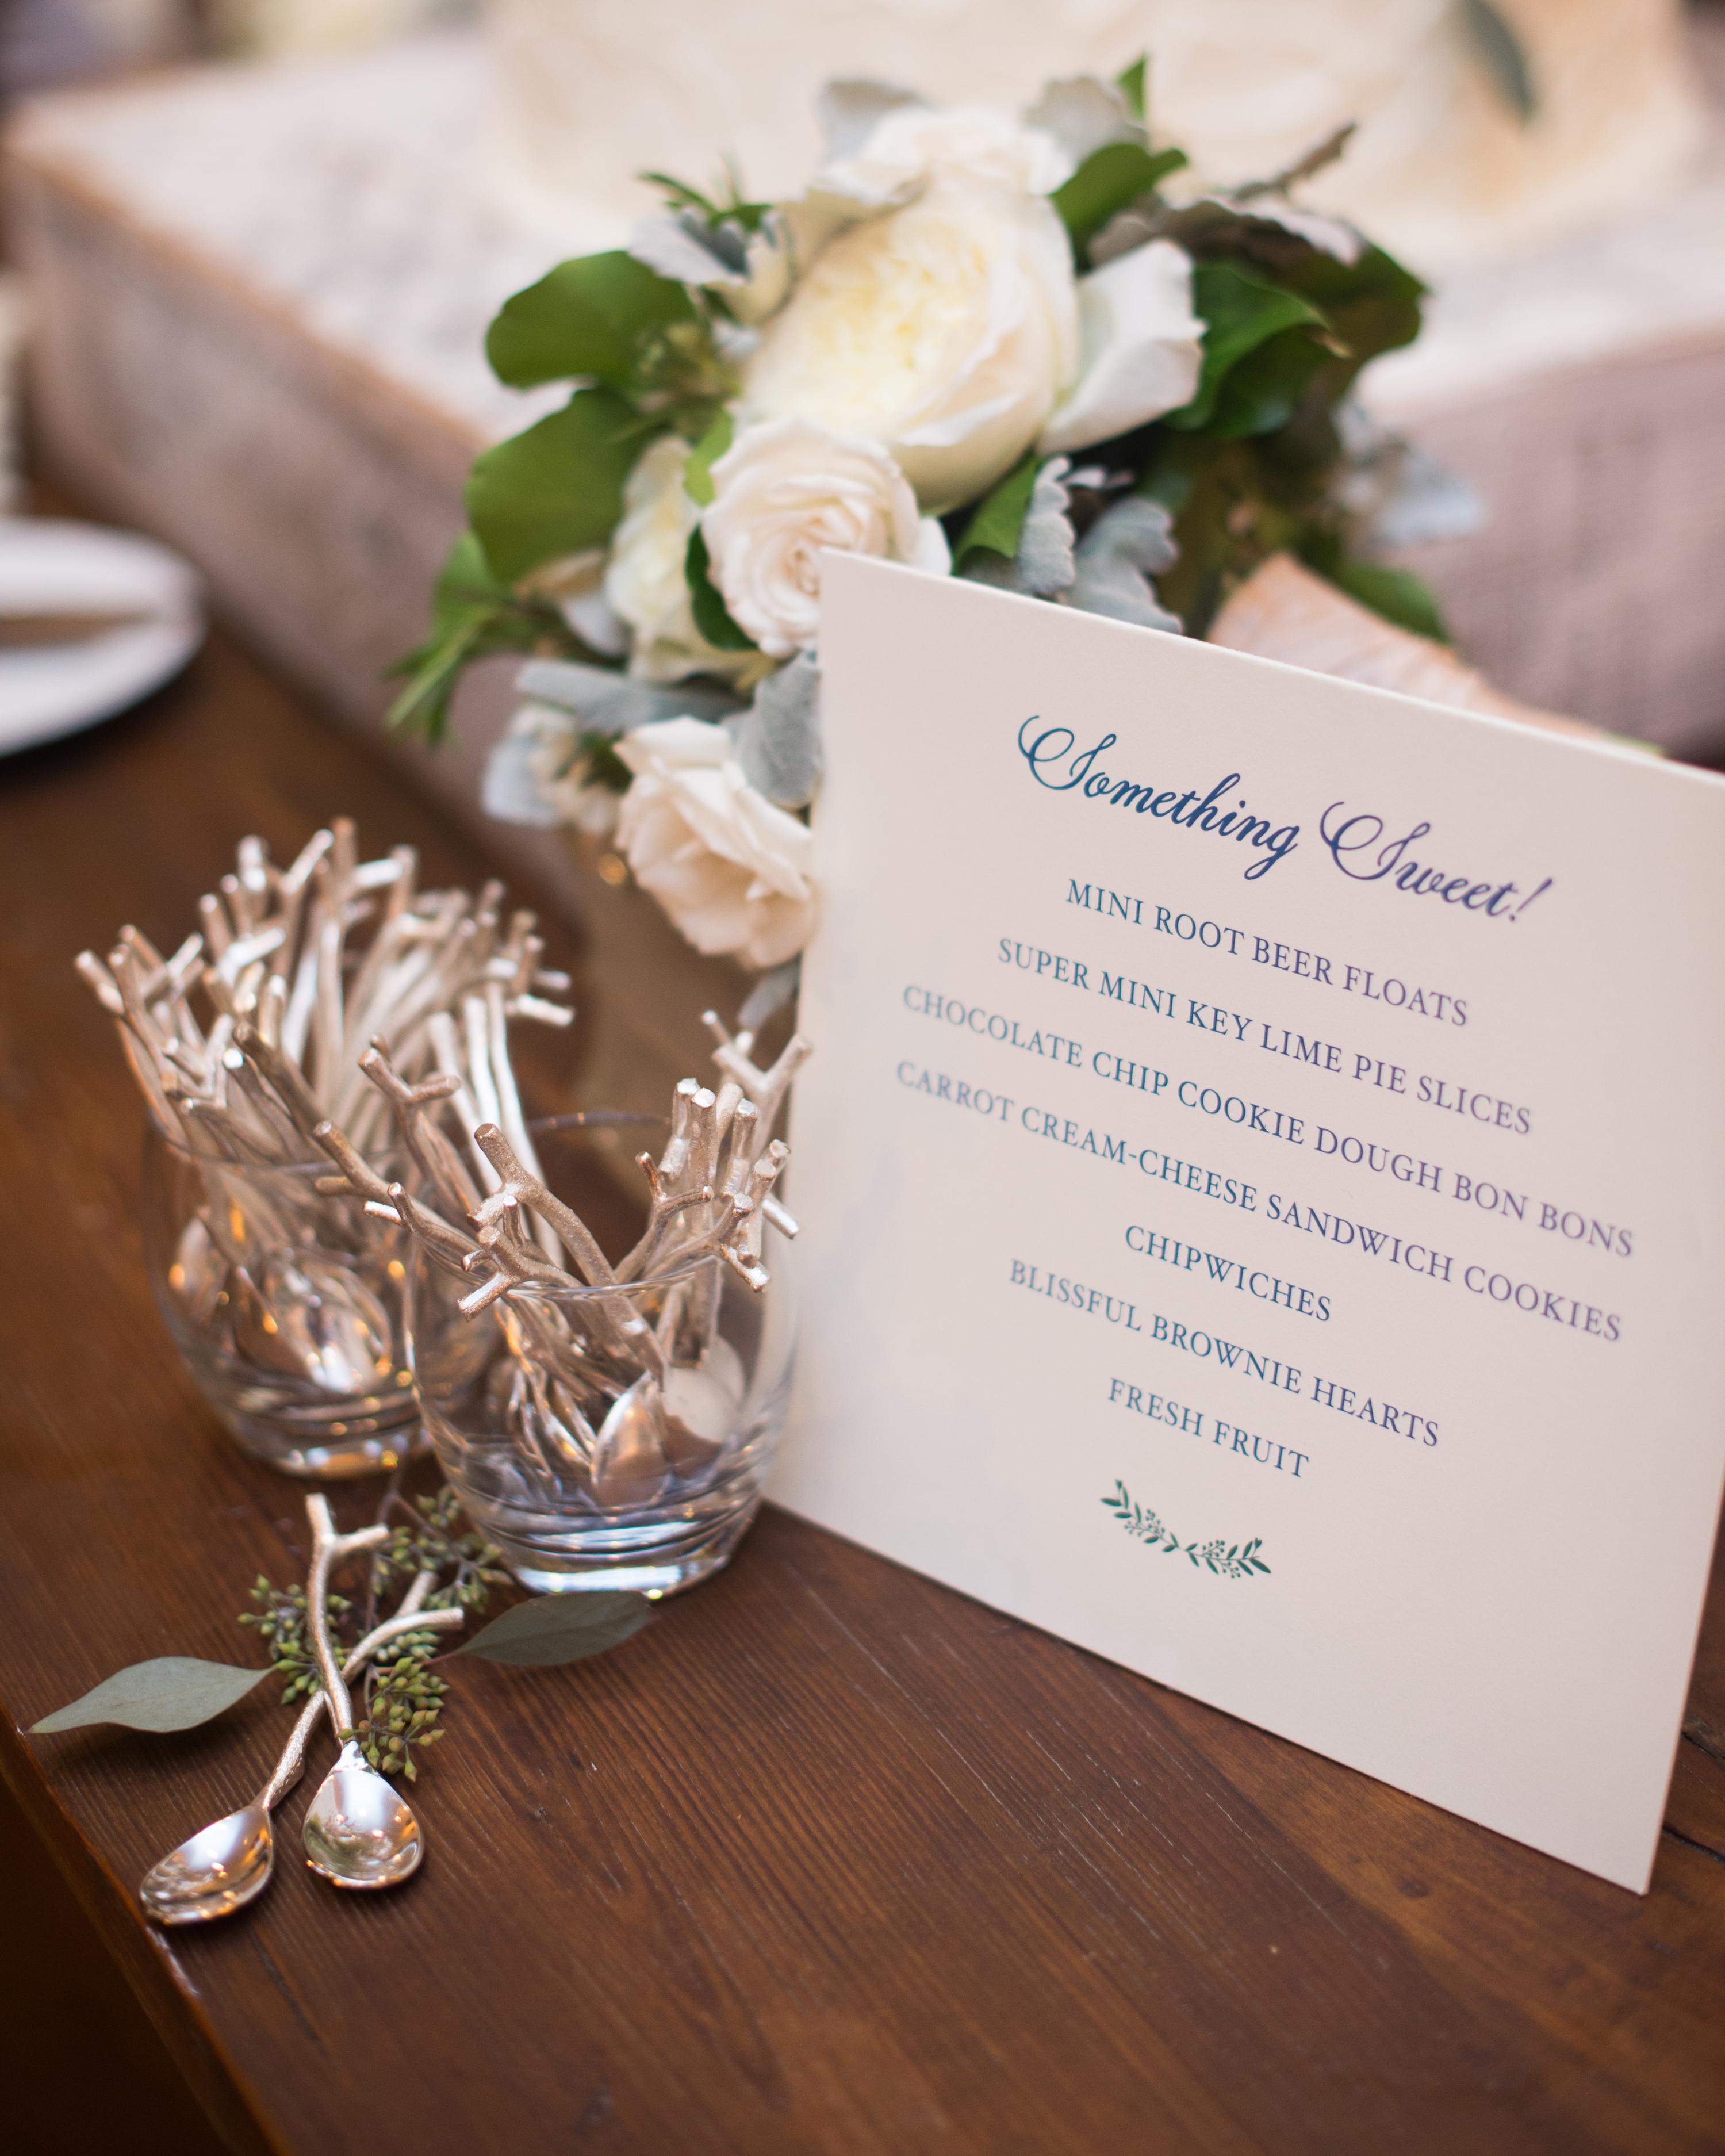 beth-scott-wedding-desserts-0981-s112077-0715.jpg